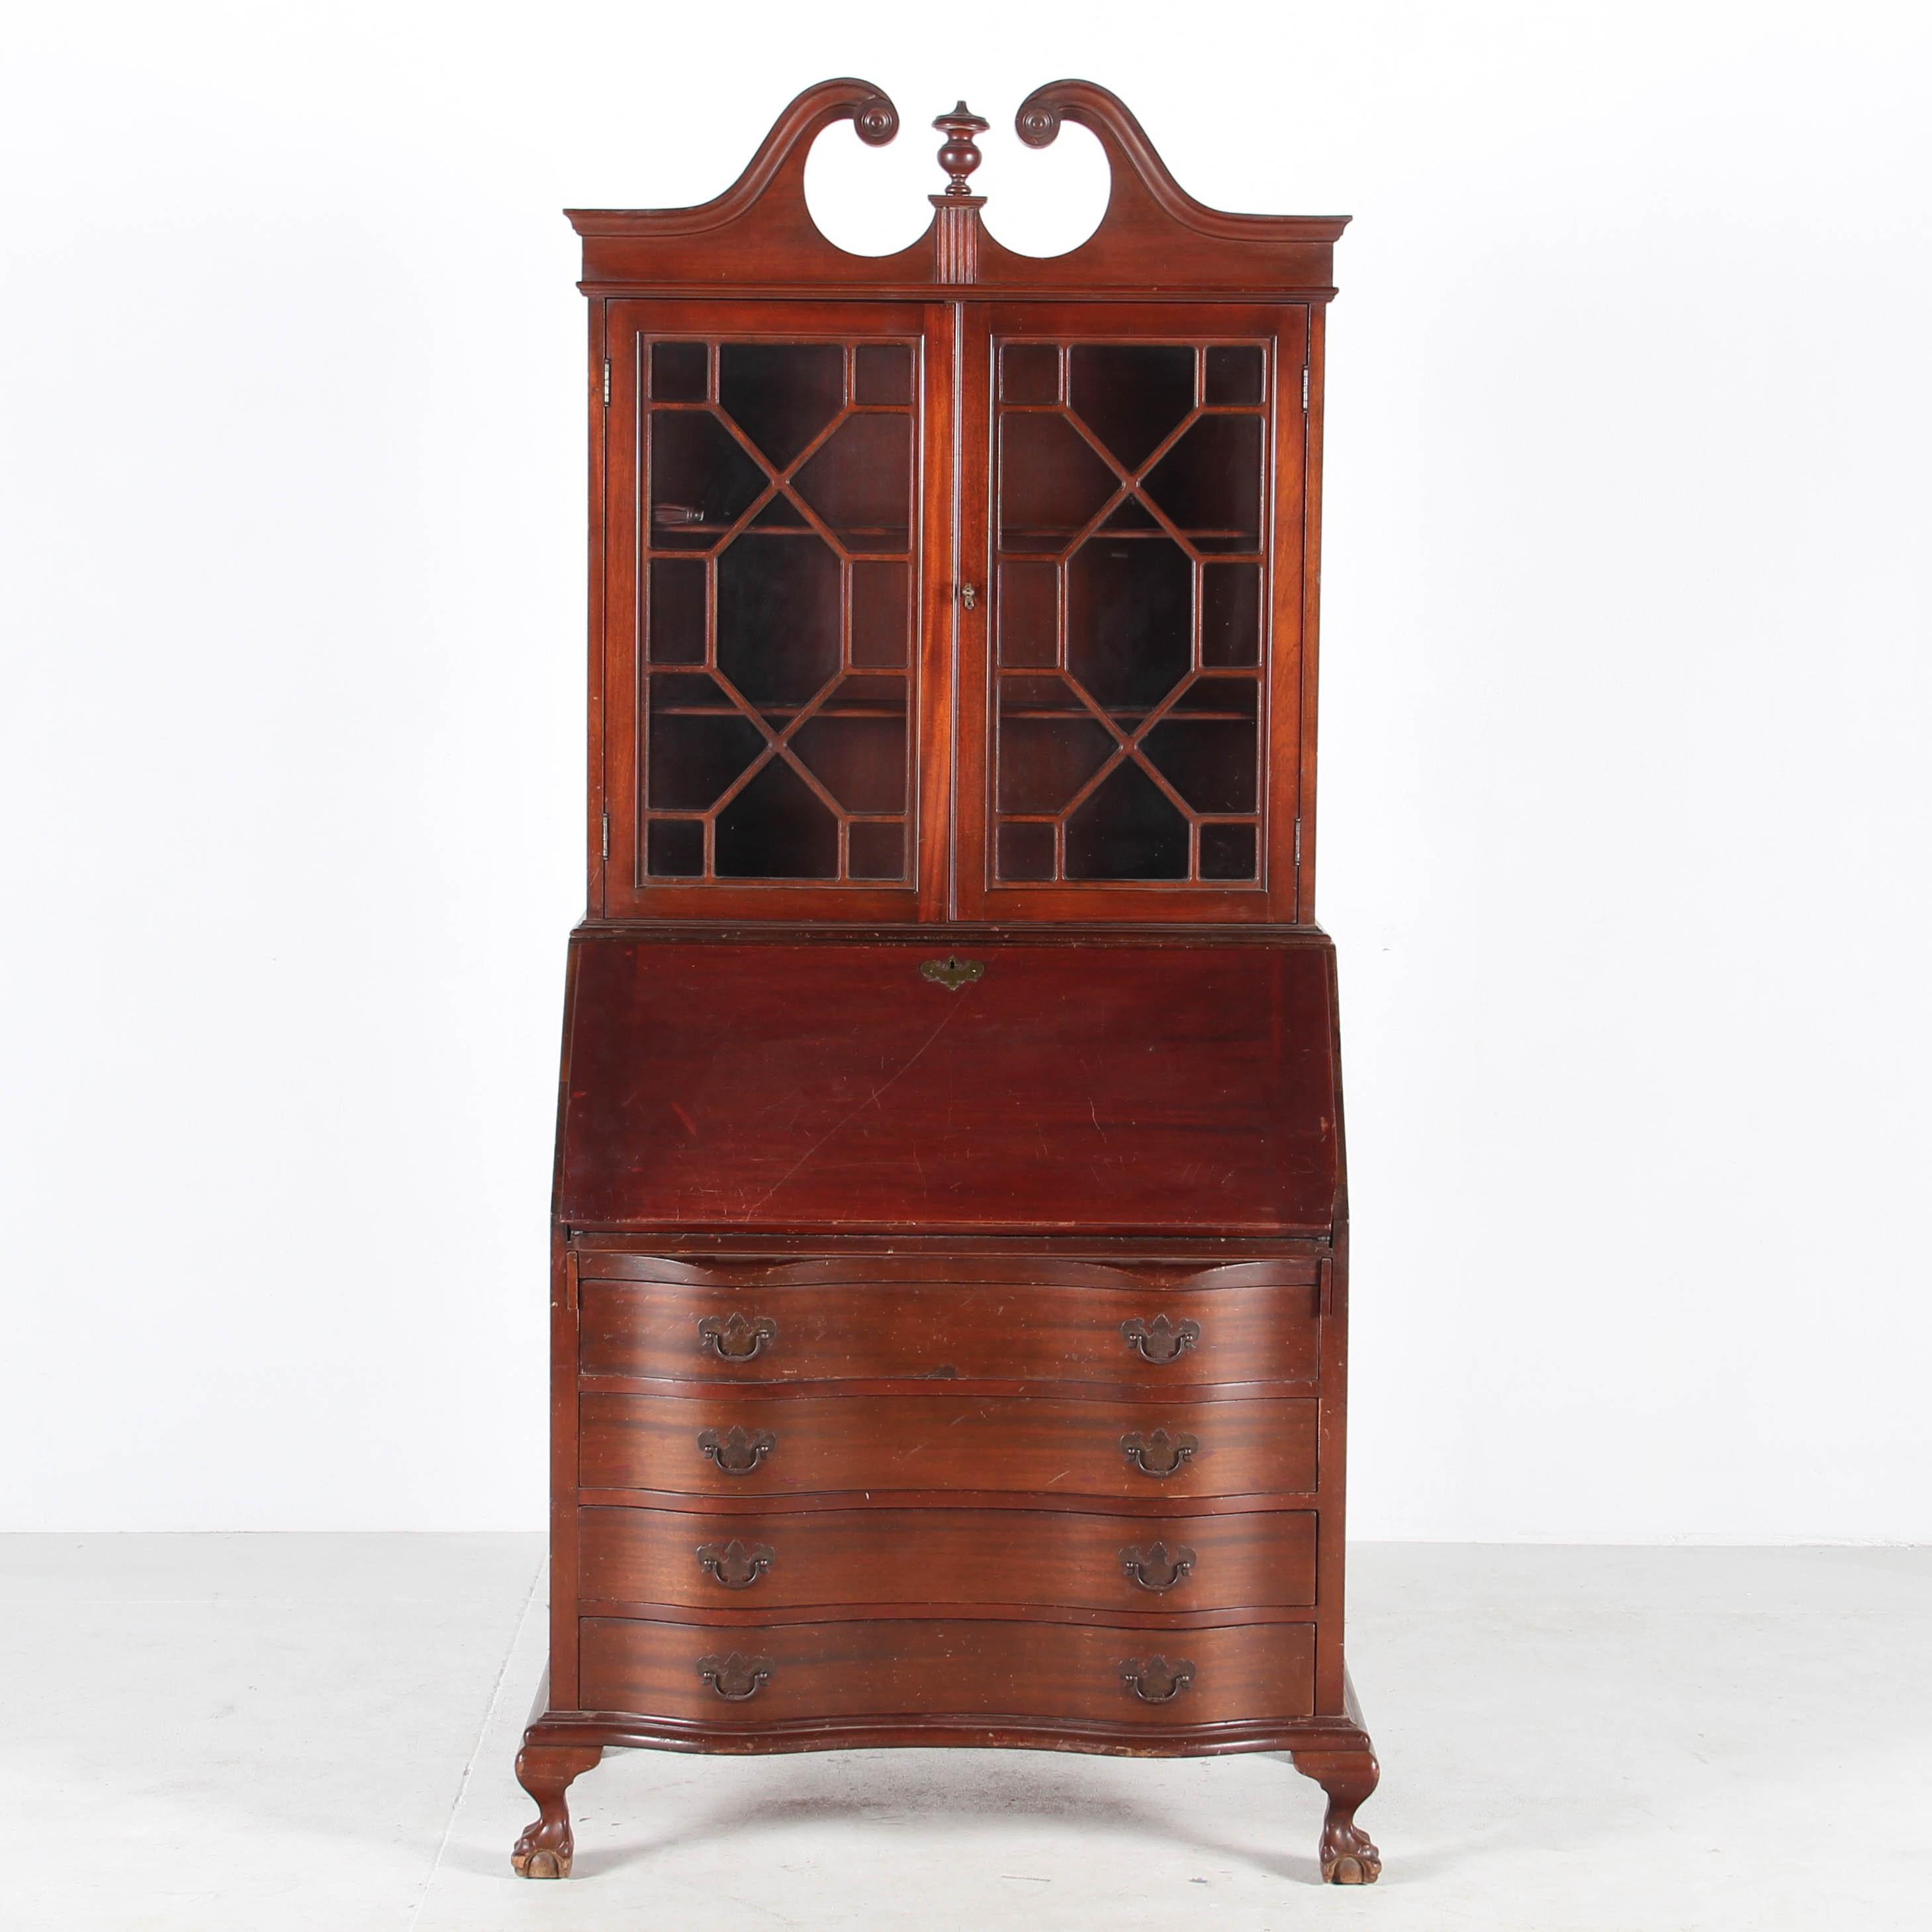 Chippendale Style Mahogany Secretary Desk From Maddox